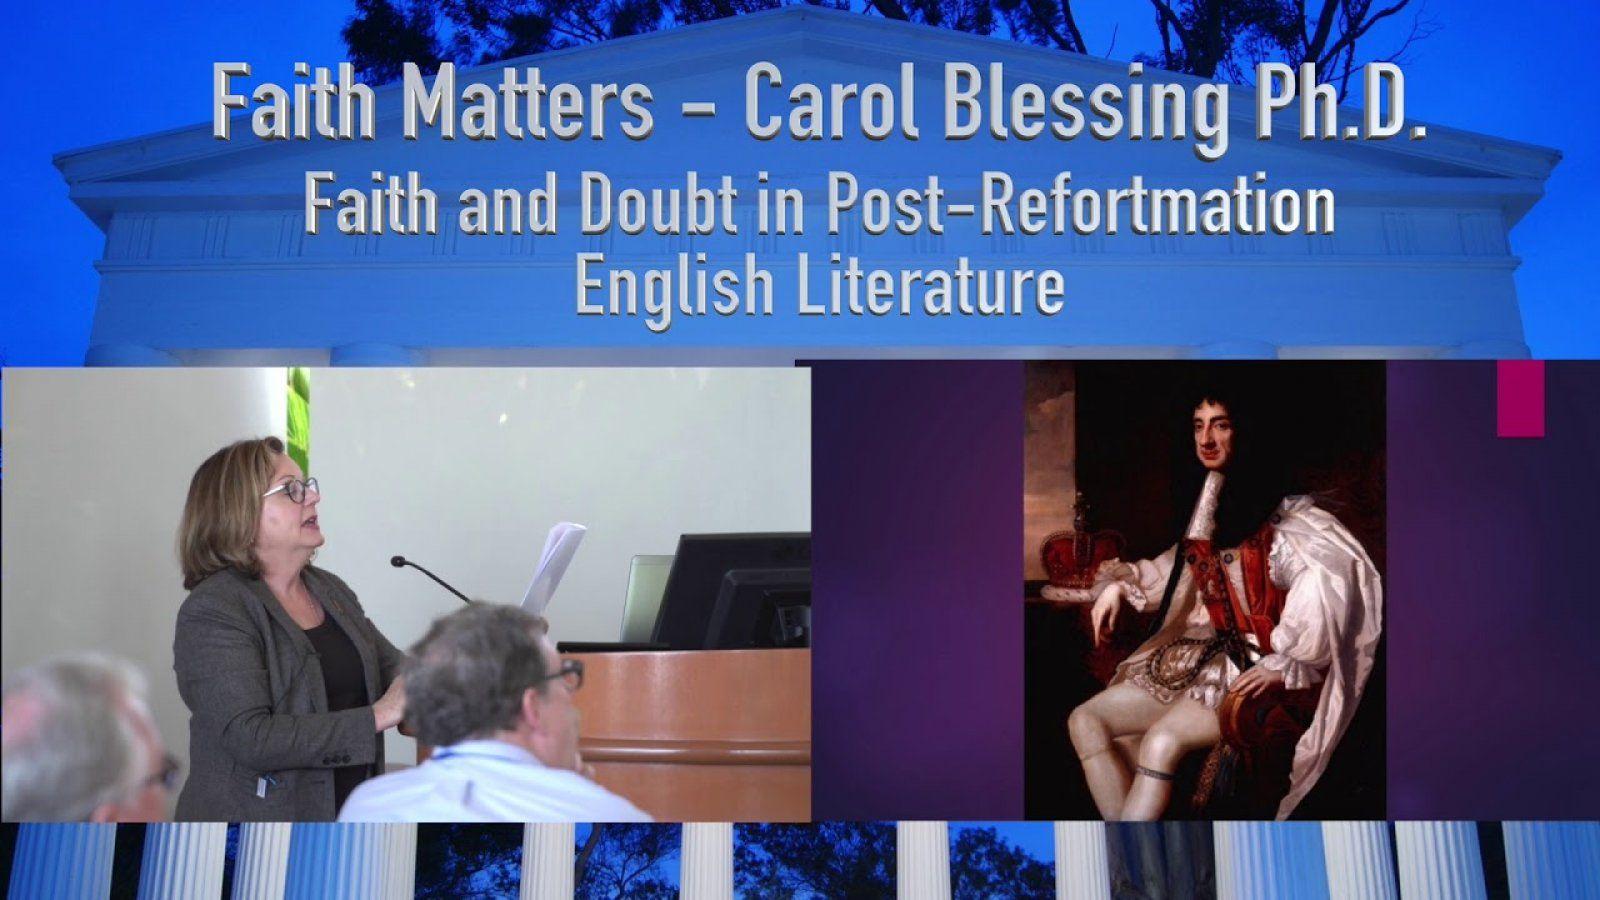 reformation in english literature